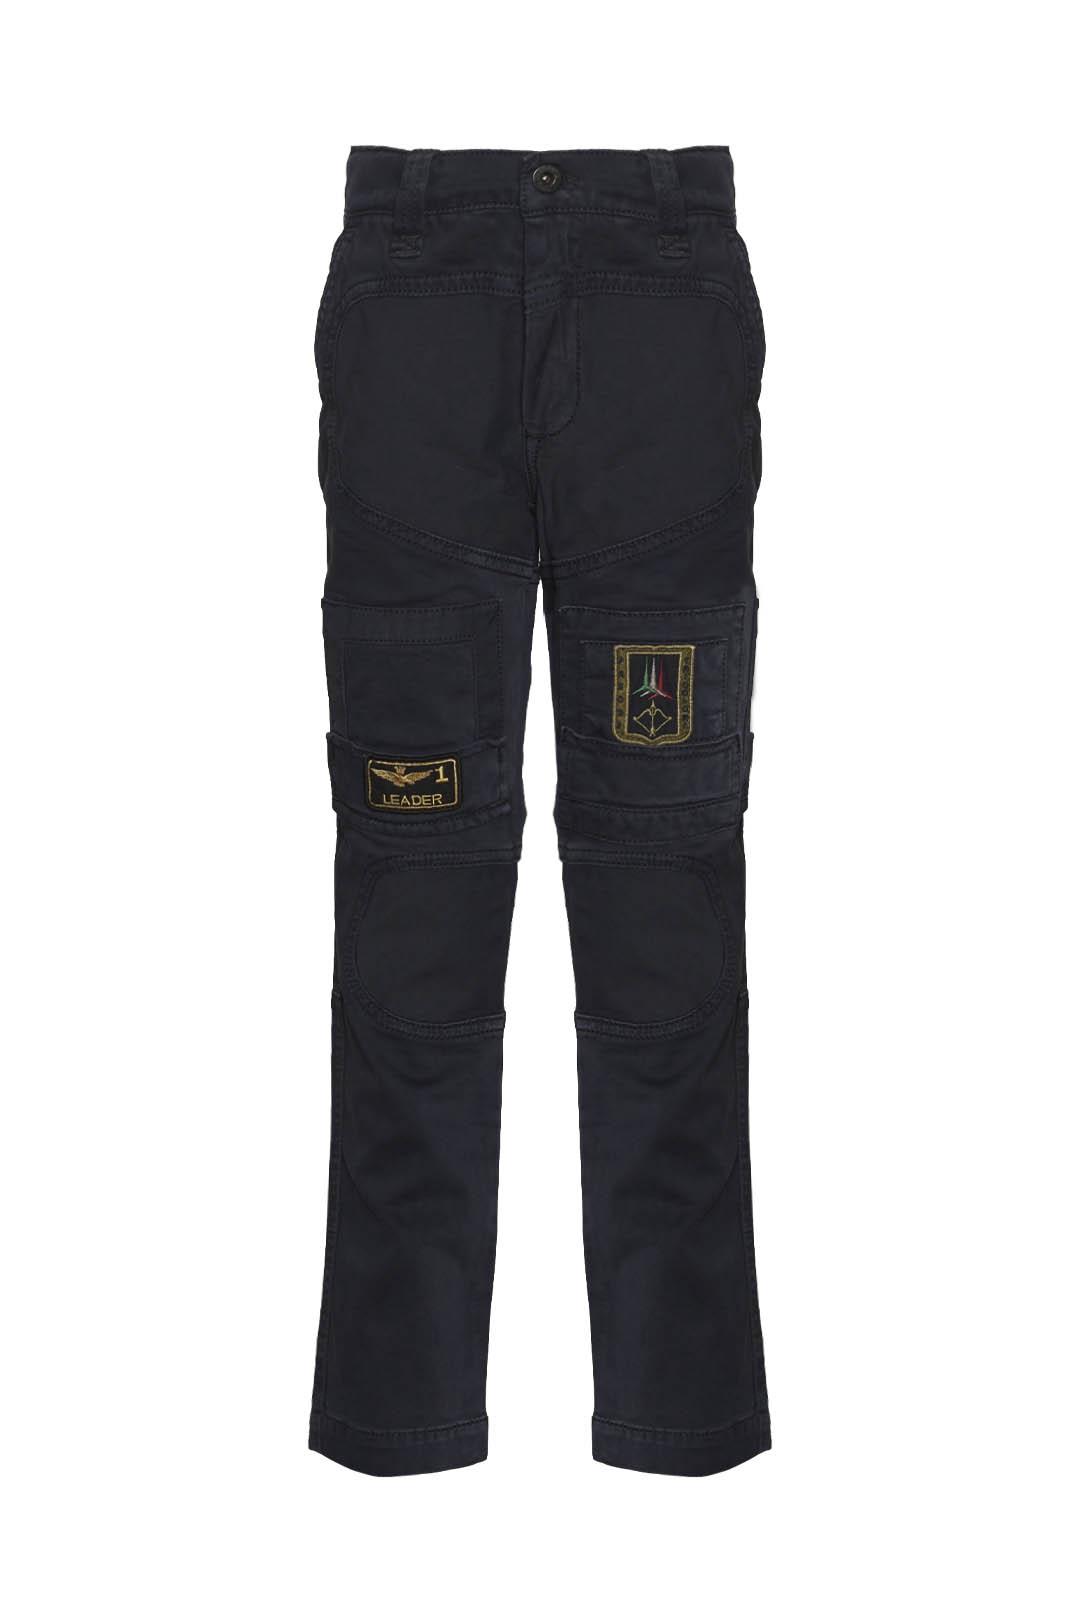 Pantalon iconique Anti-G                 1